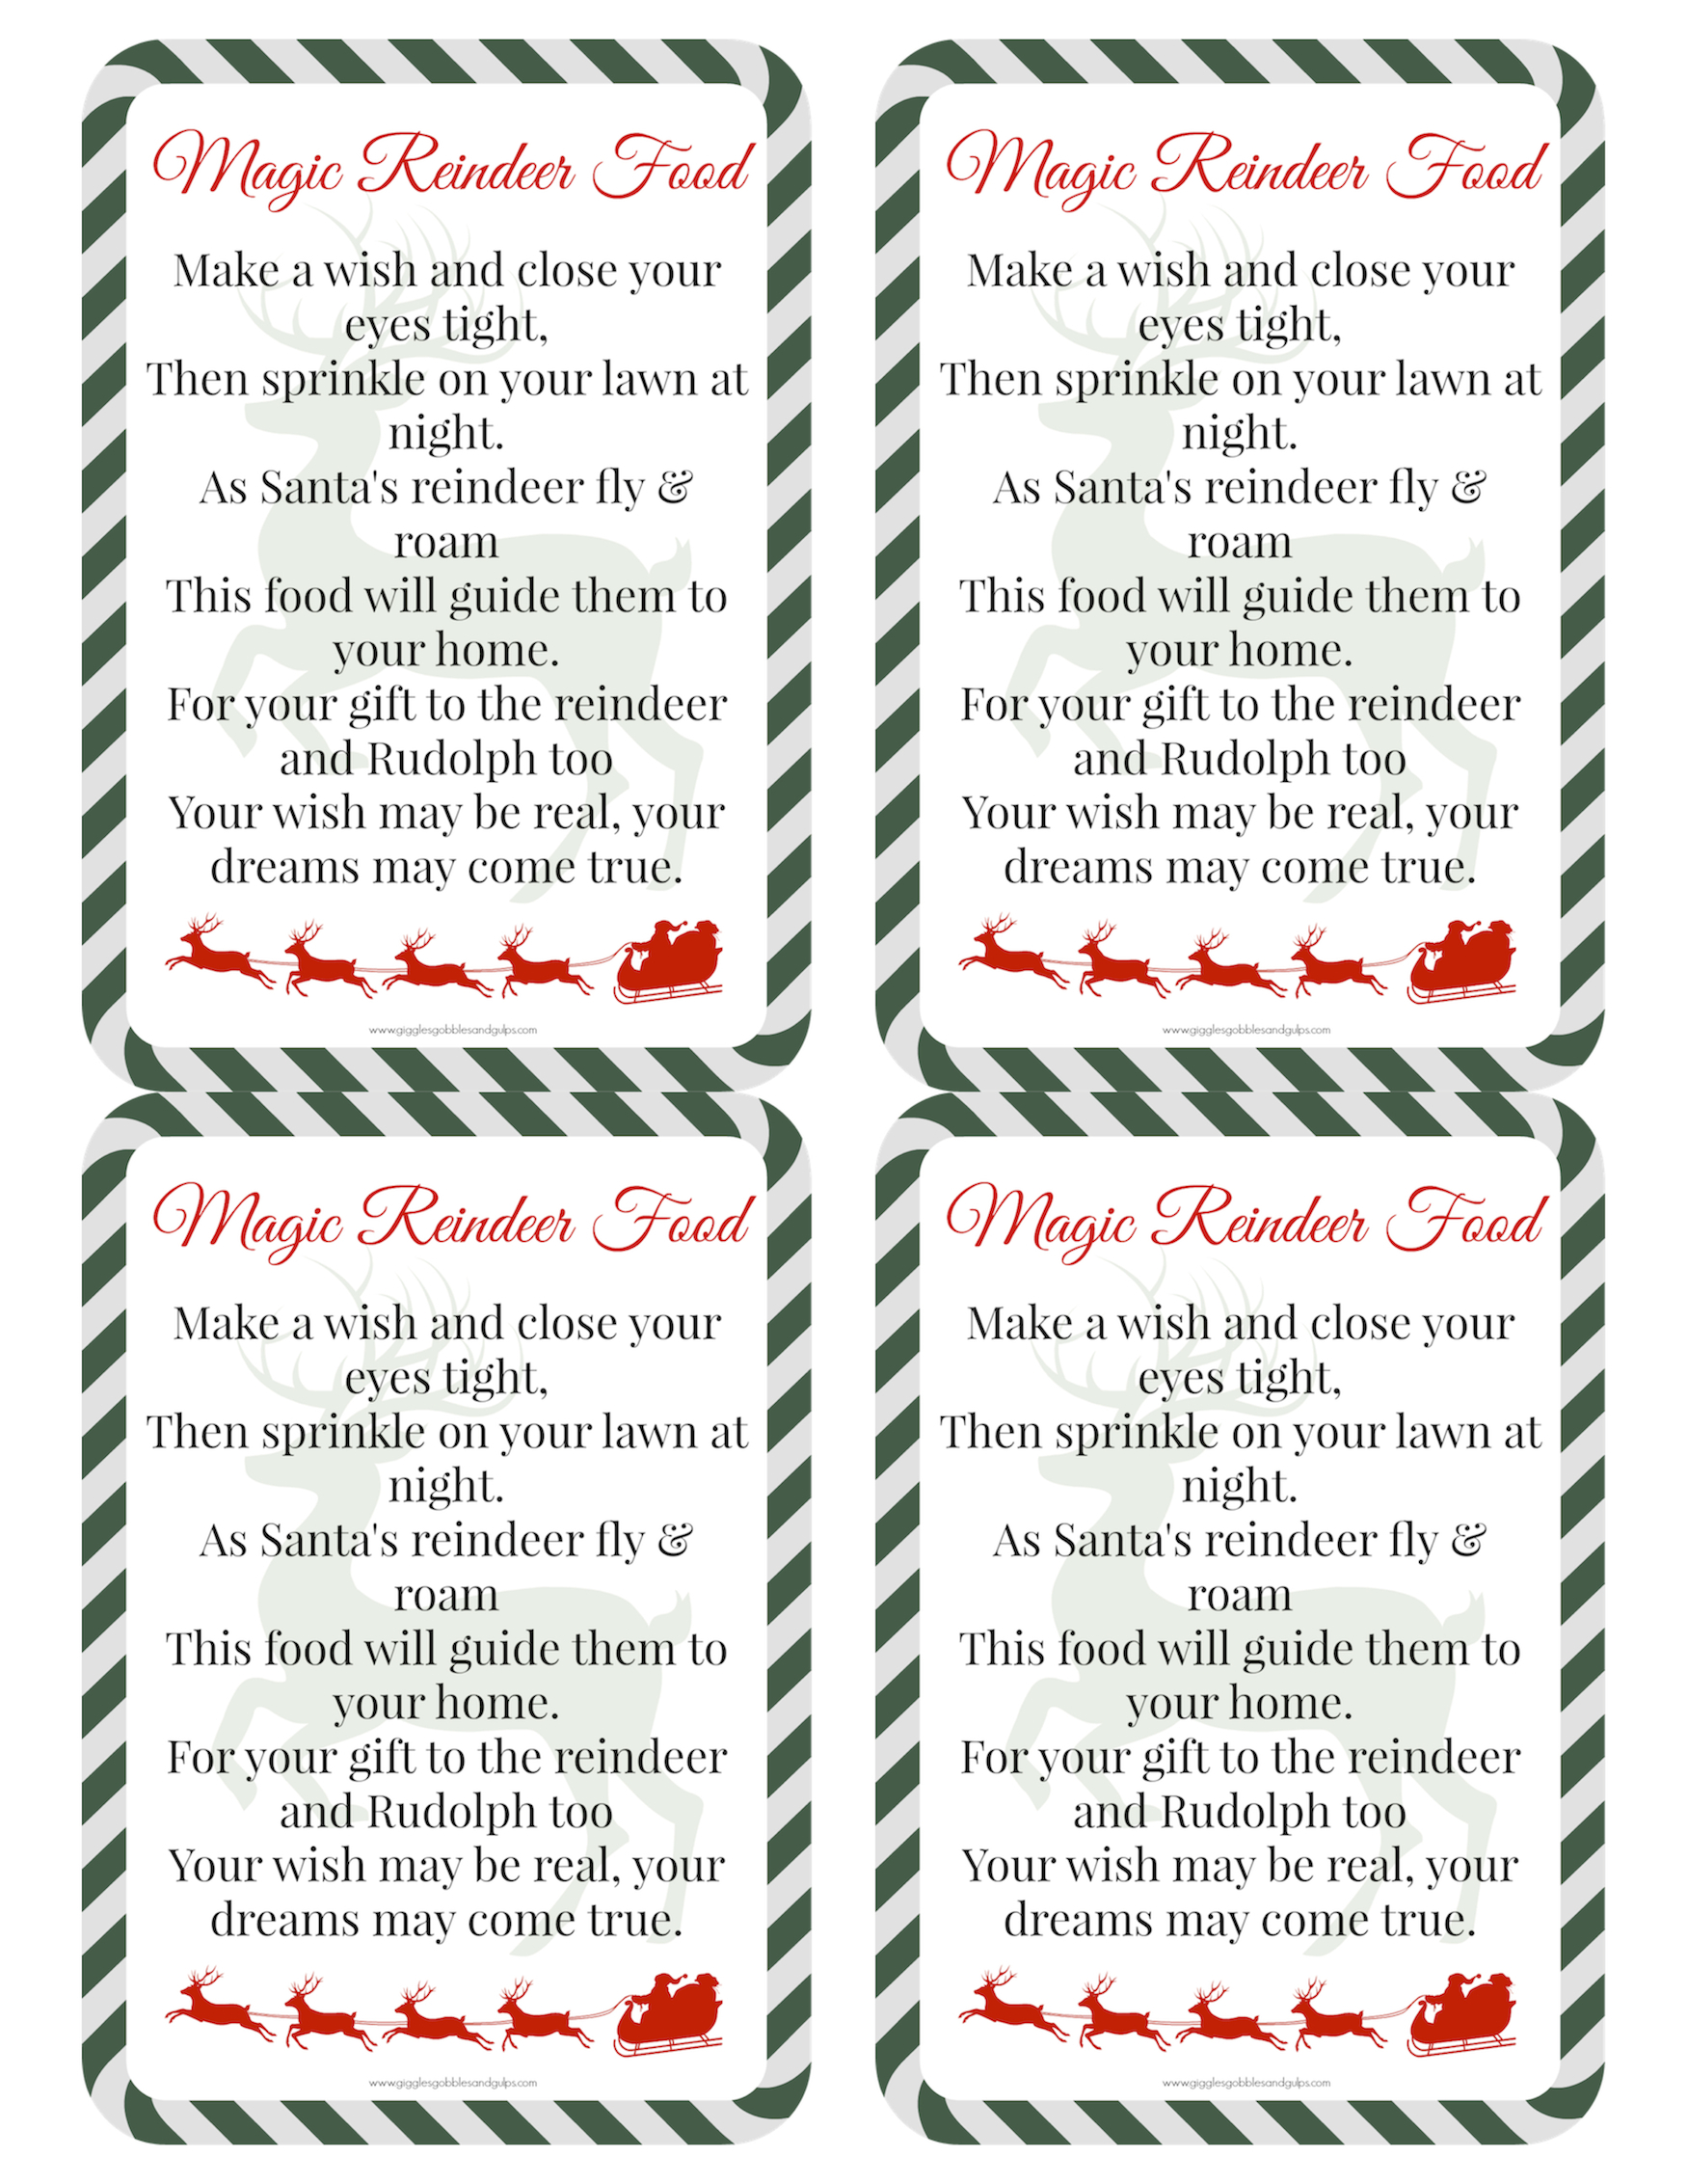 Magic Reindeer Food Recipe And Poem